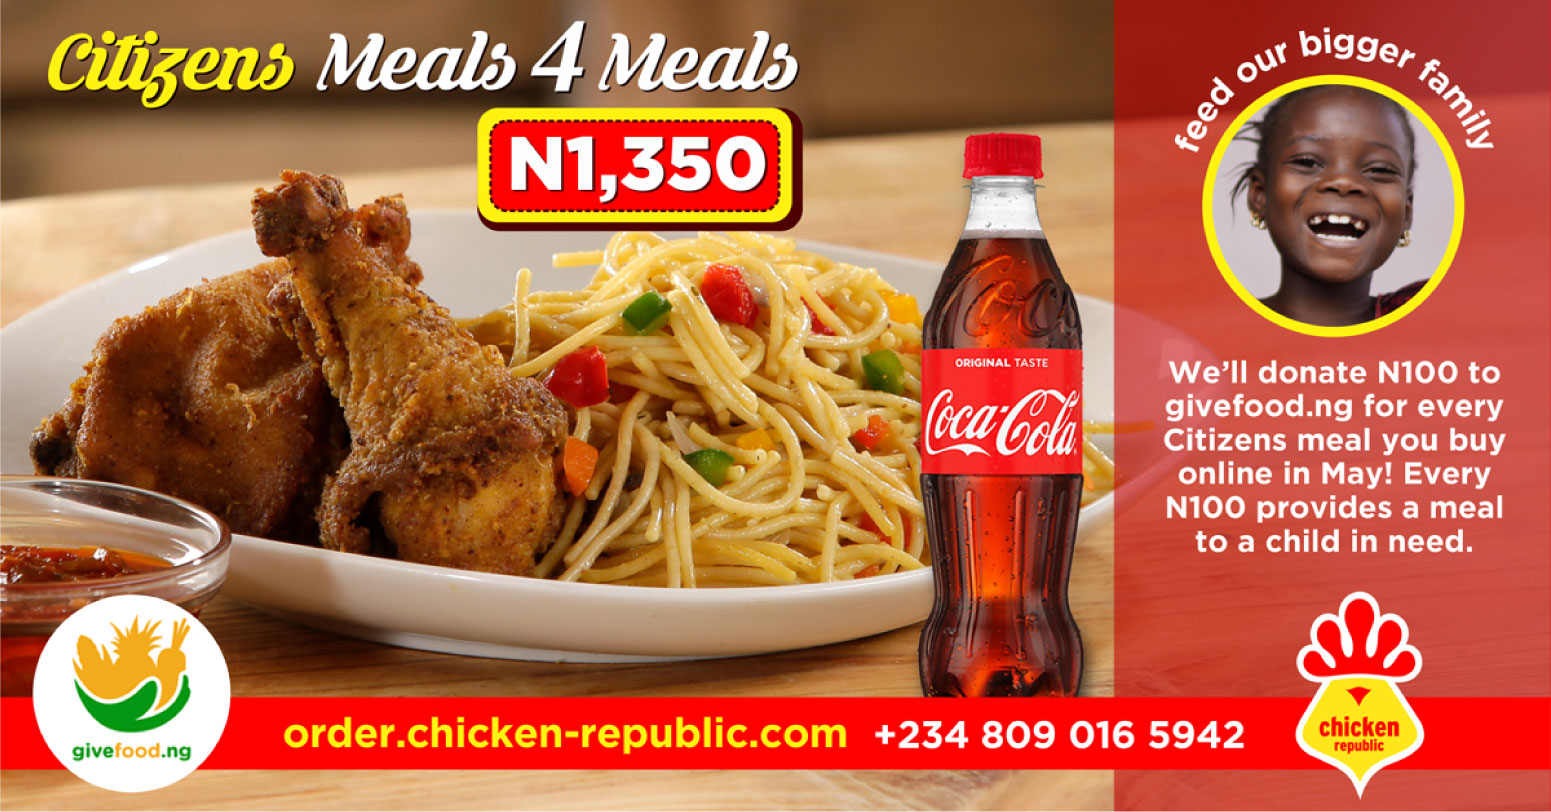 Chicken Republic - Citizens Meals 4 Meals